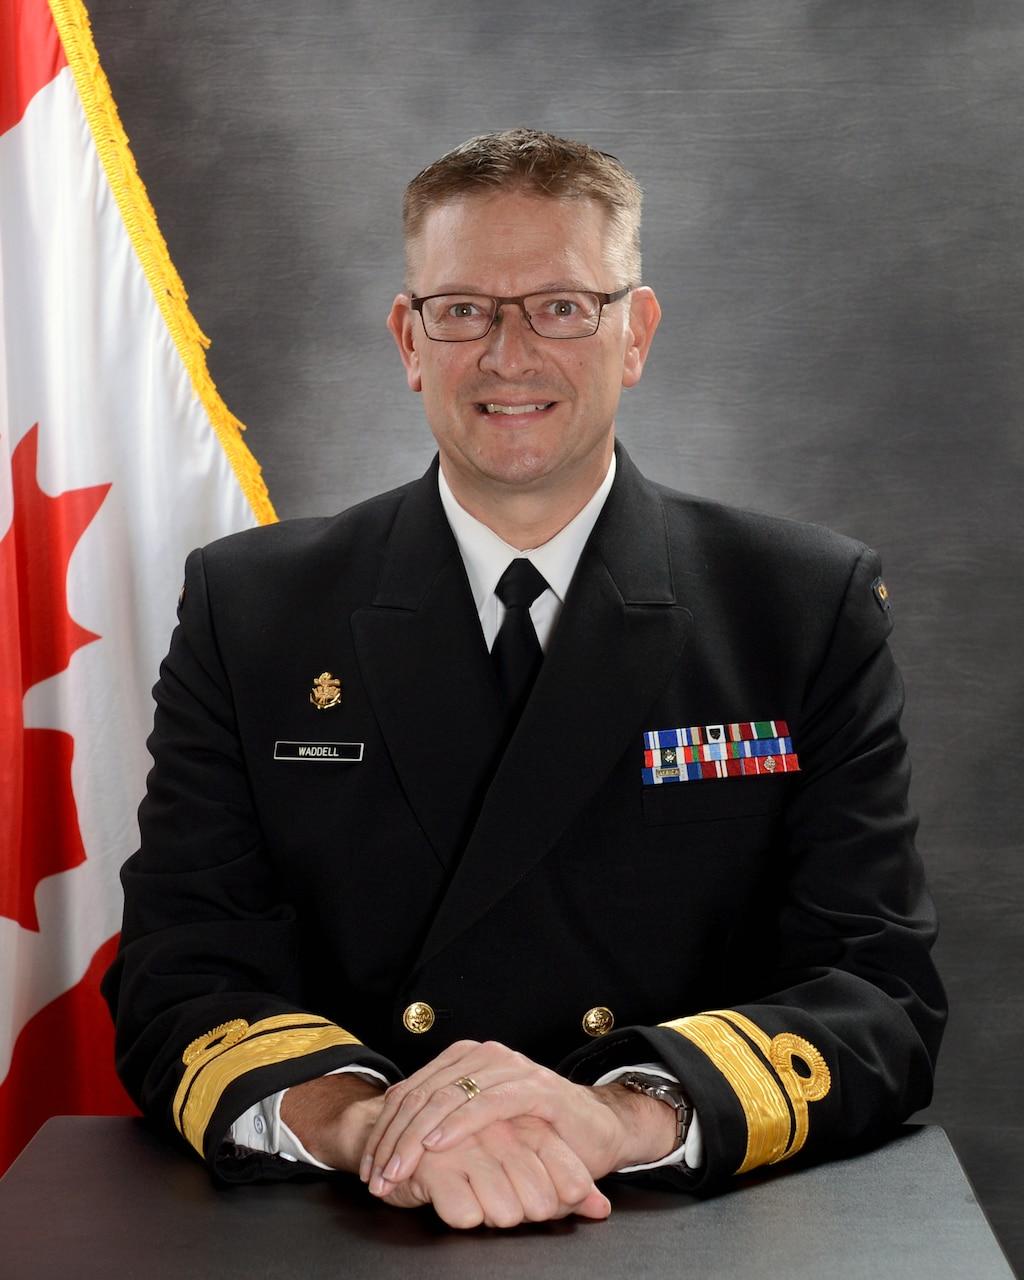 www.c2f.usff.navy.mil